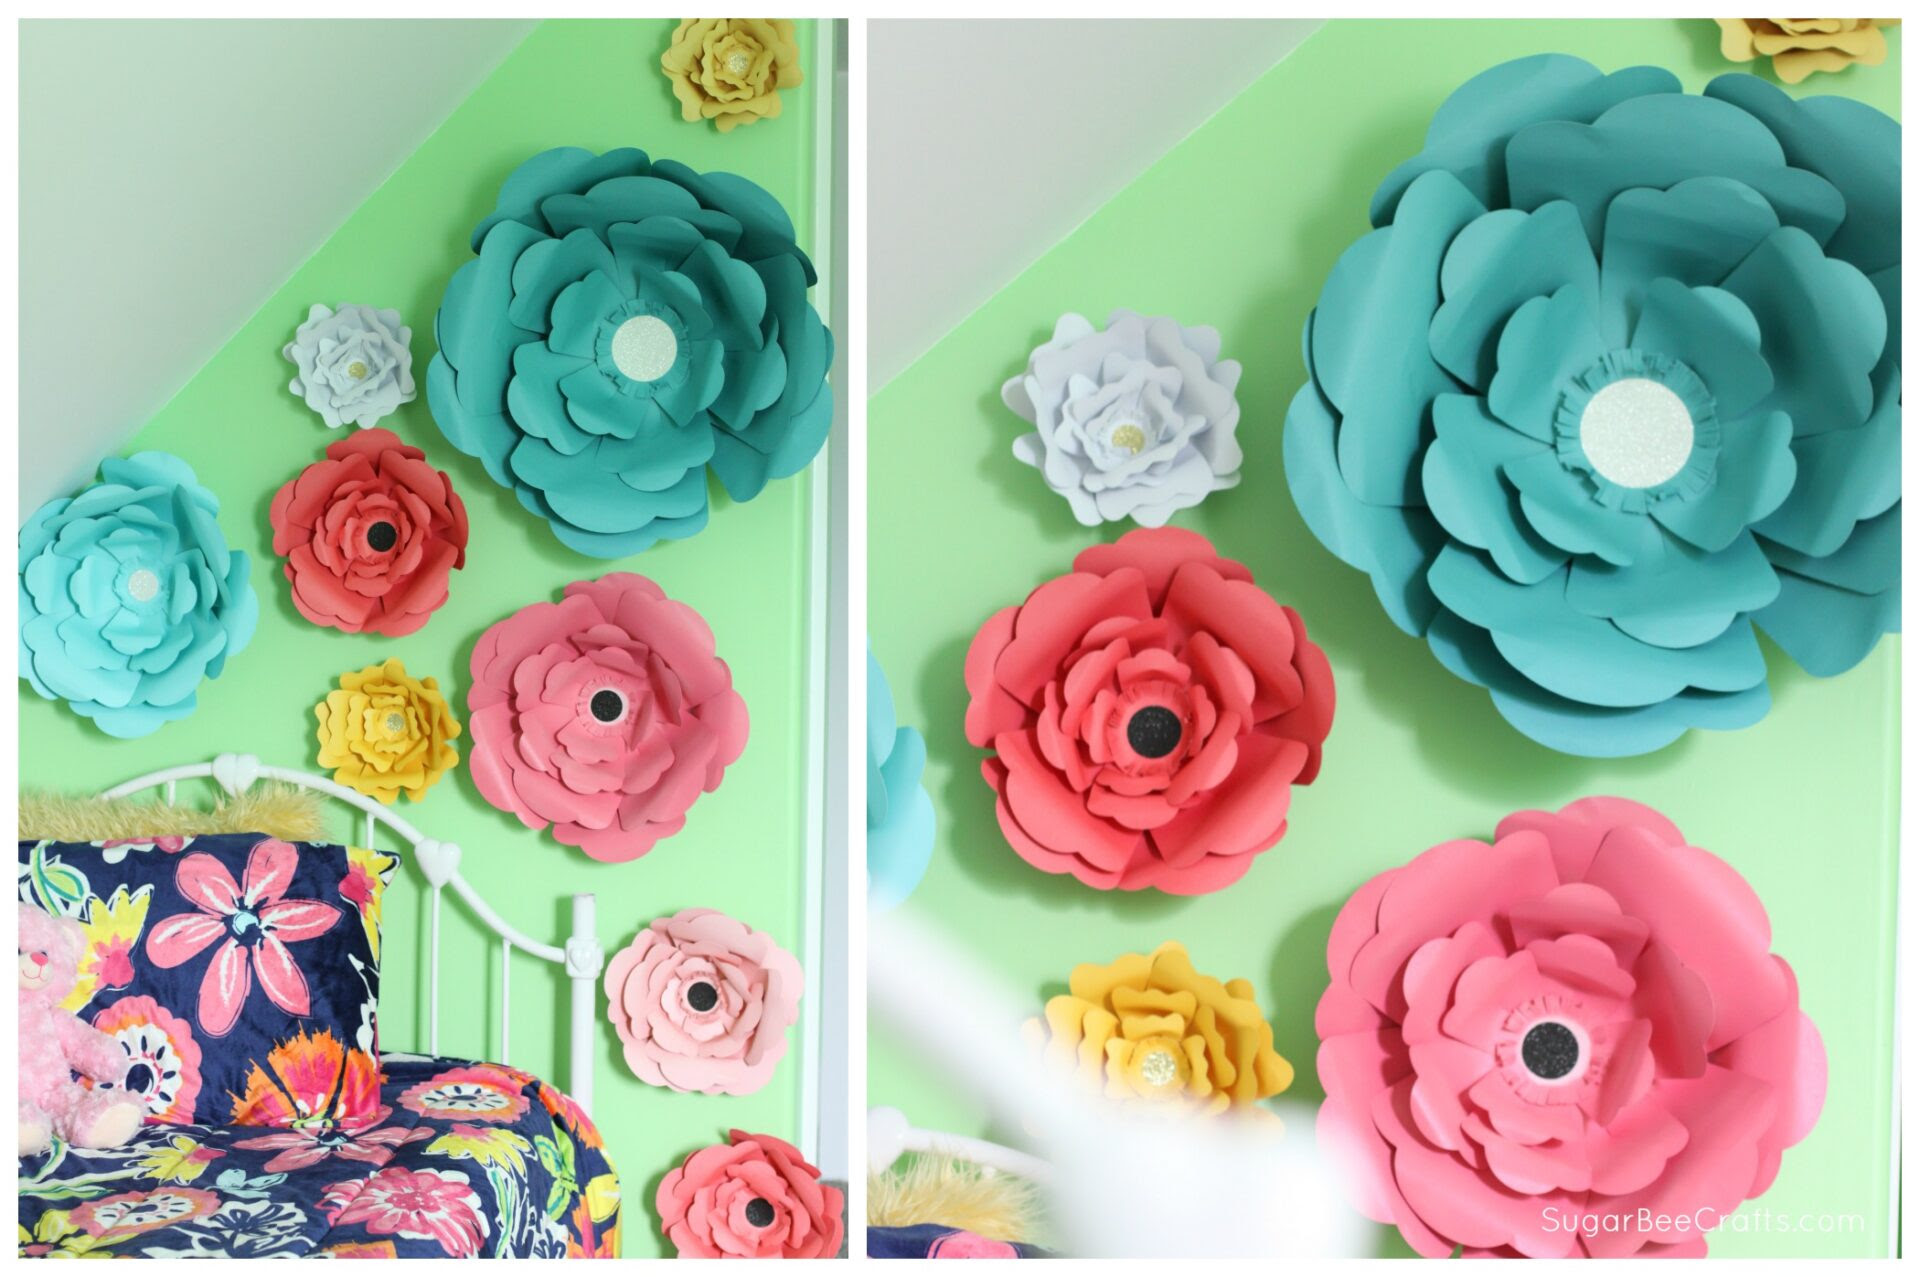 Big Bloom Paper Flower Wall Decor - Sugar Bee Crafts